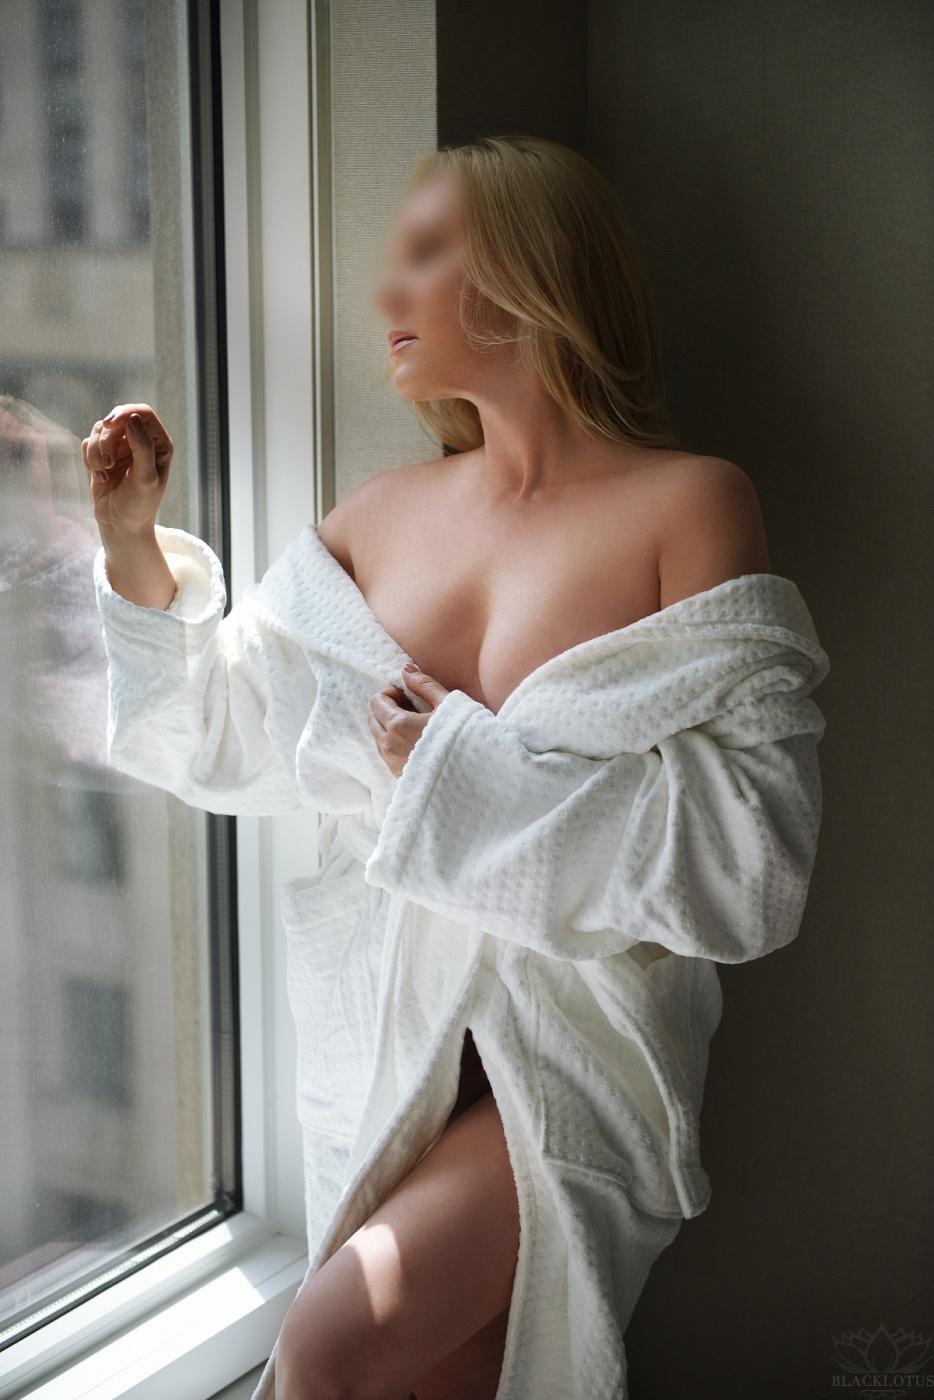 Claire Rietveld